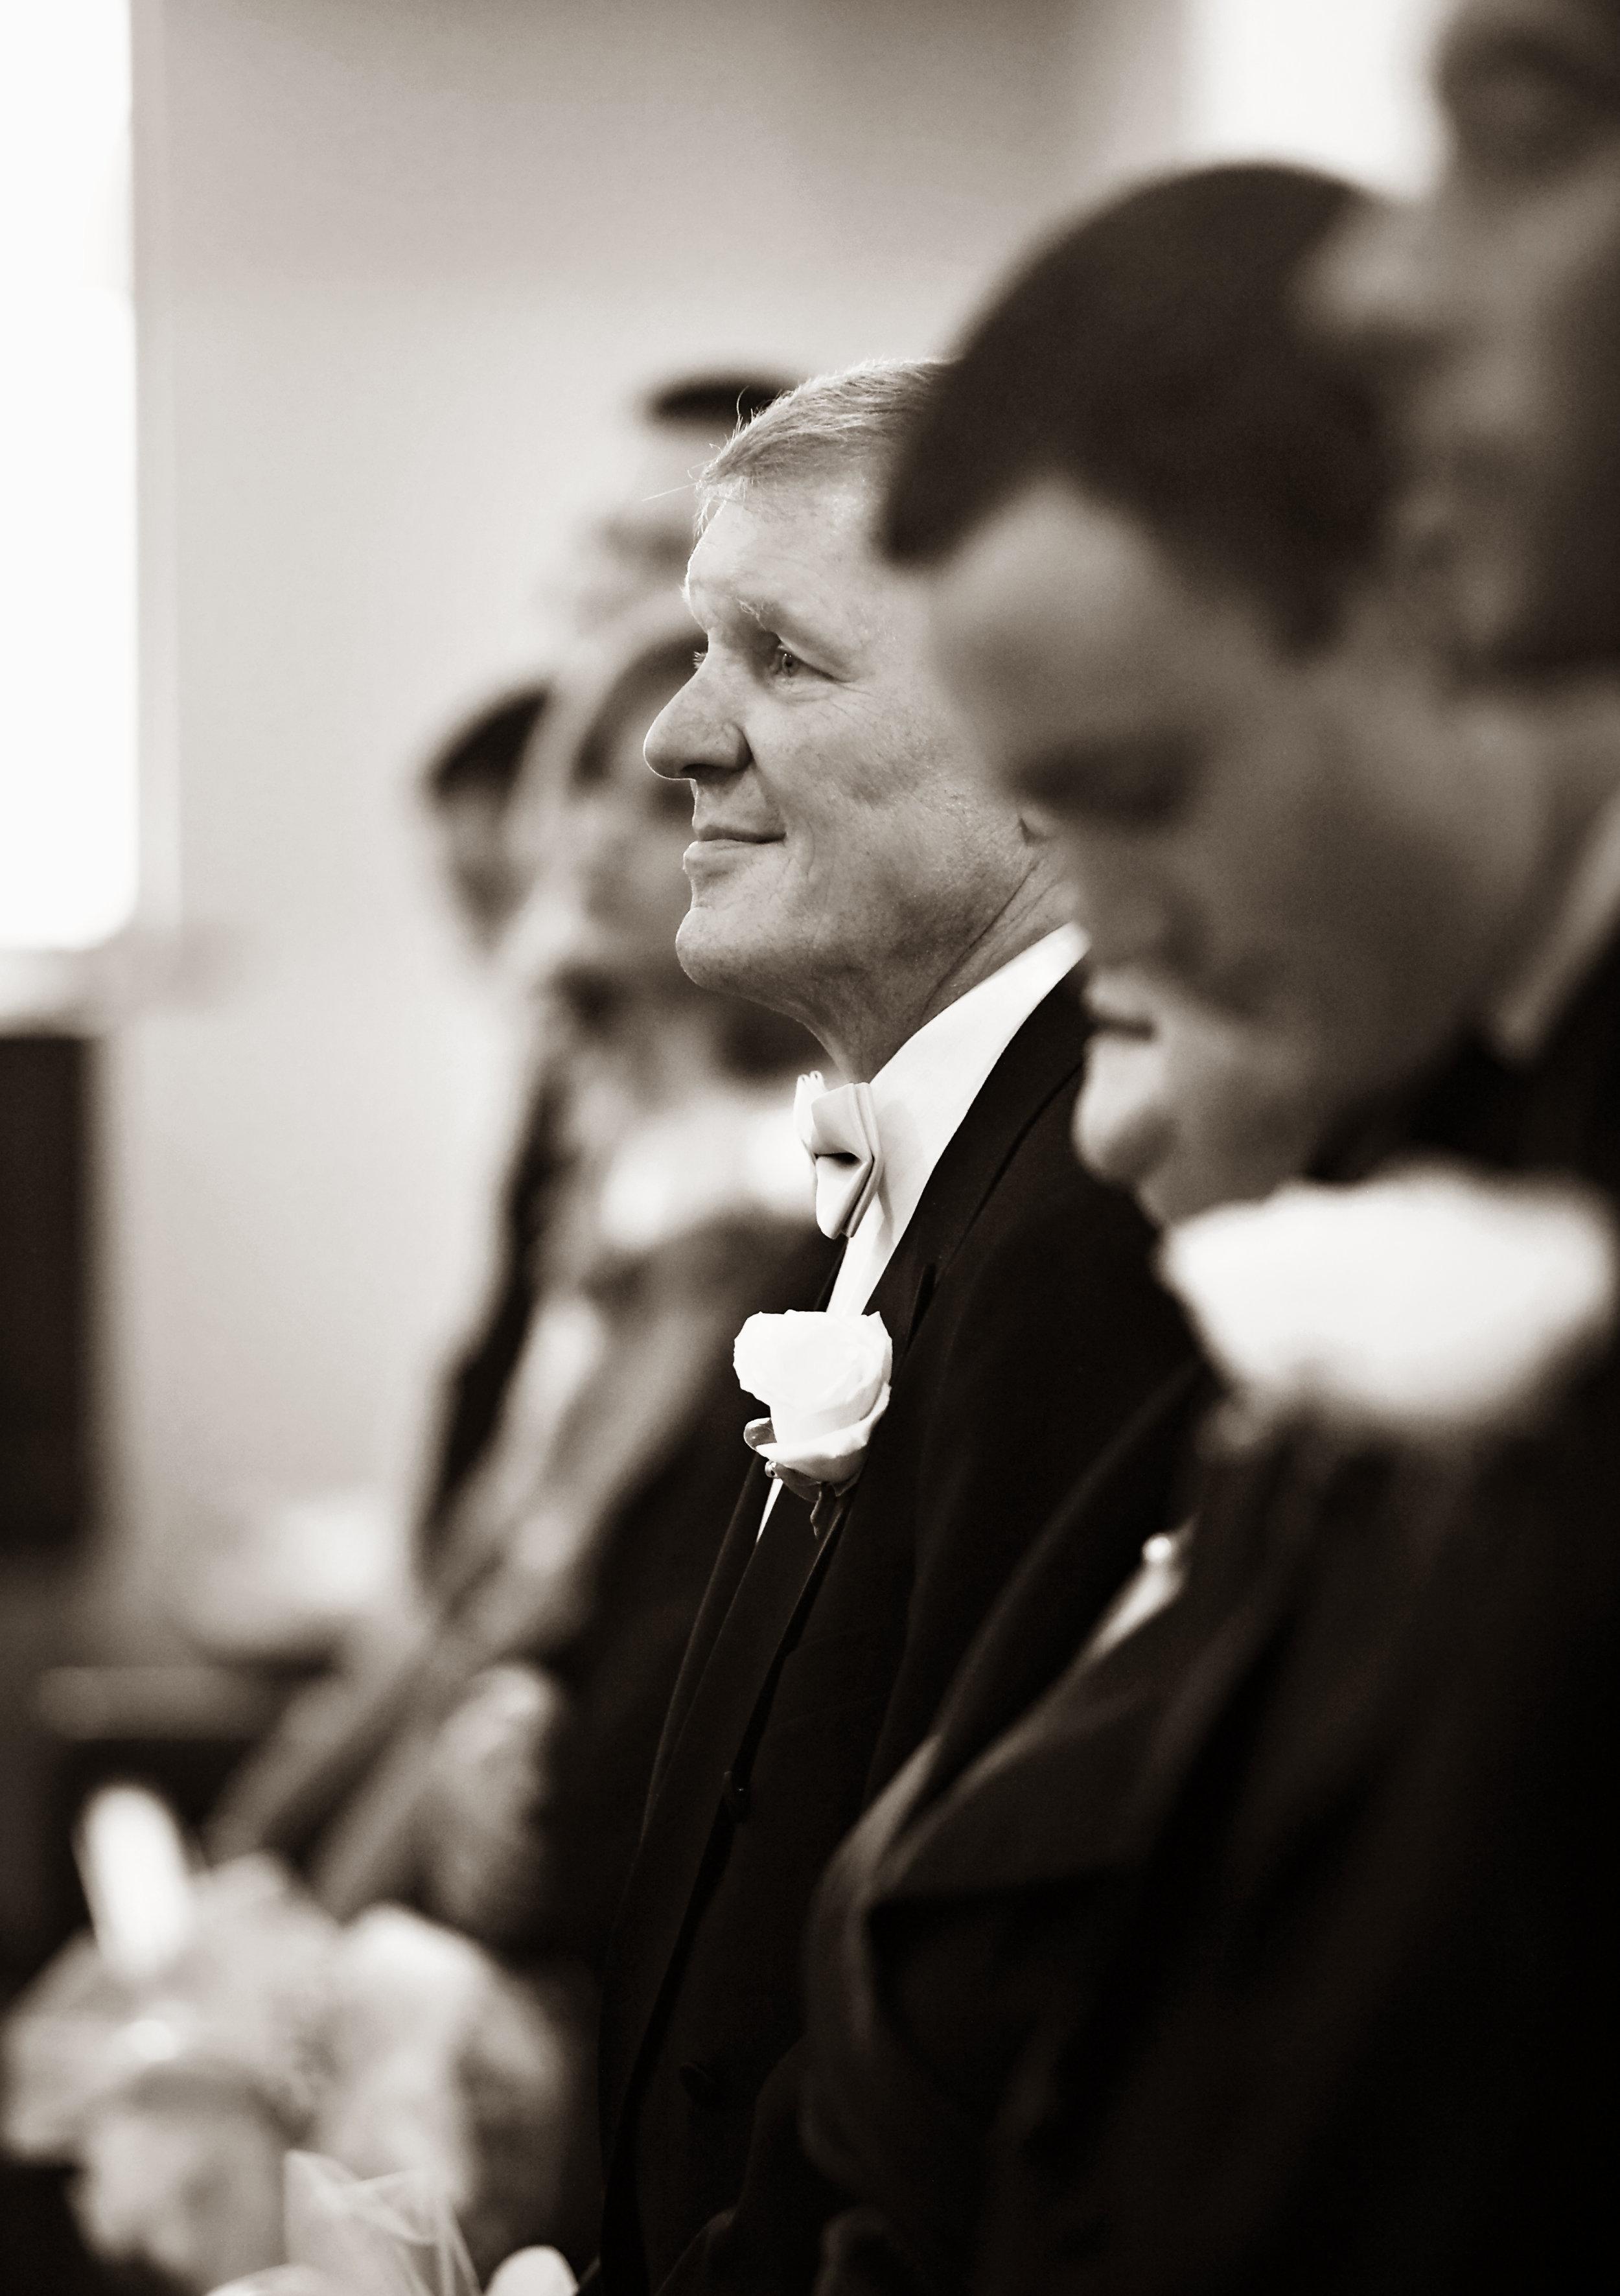 Weddings - 04 Ceremony 0012.JPG